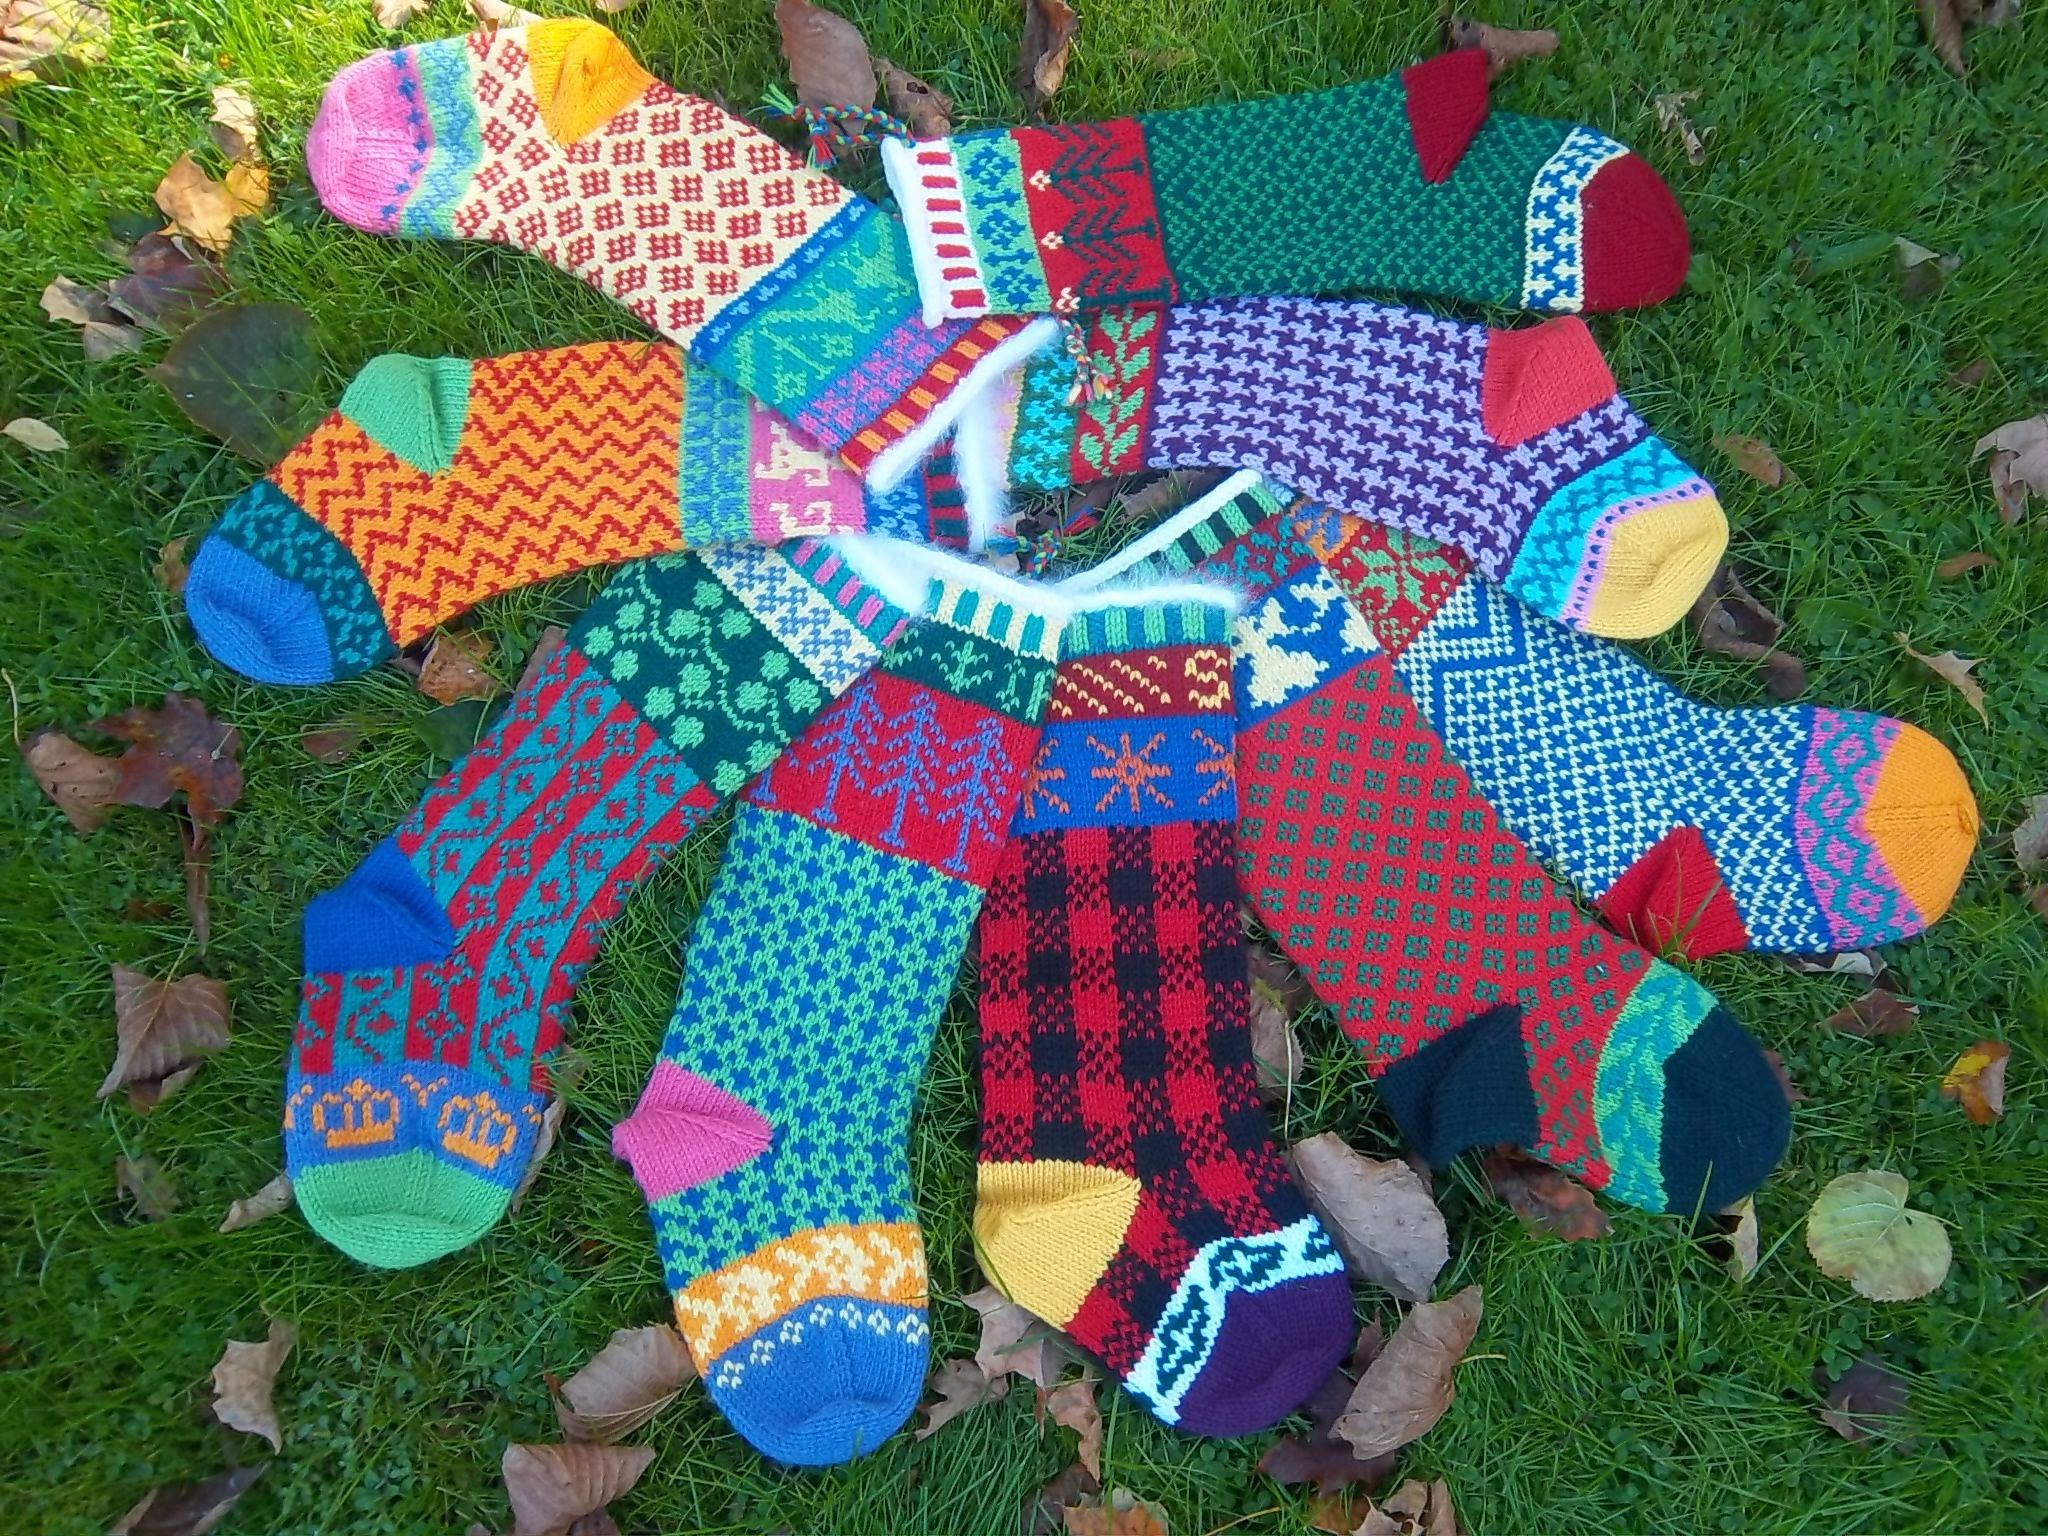 Cascade Christmas Stockings by Marji LaFreniere- free pattern http://www.cascadeyarns.com/patternsFree/W104_220.pdf